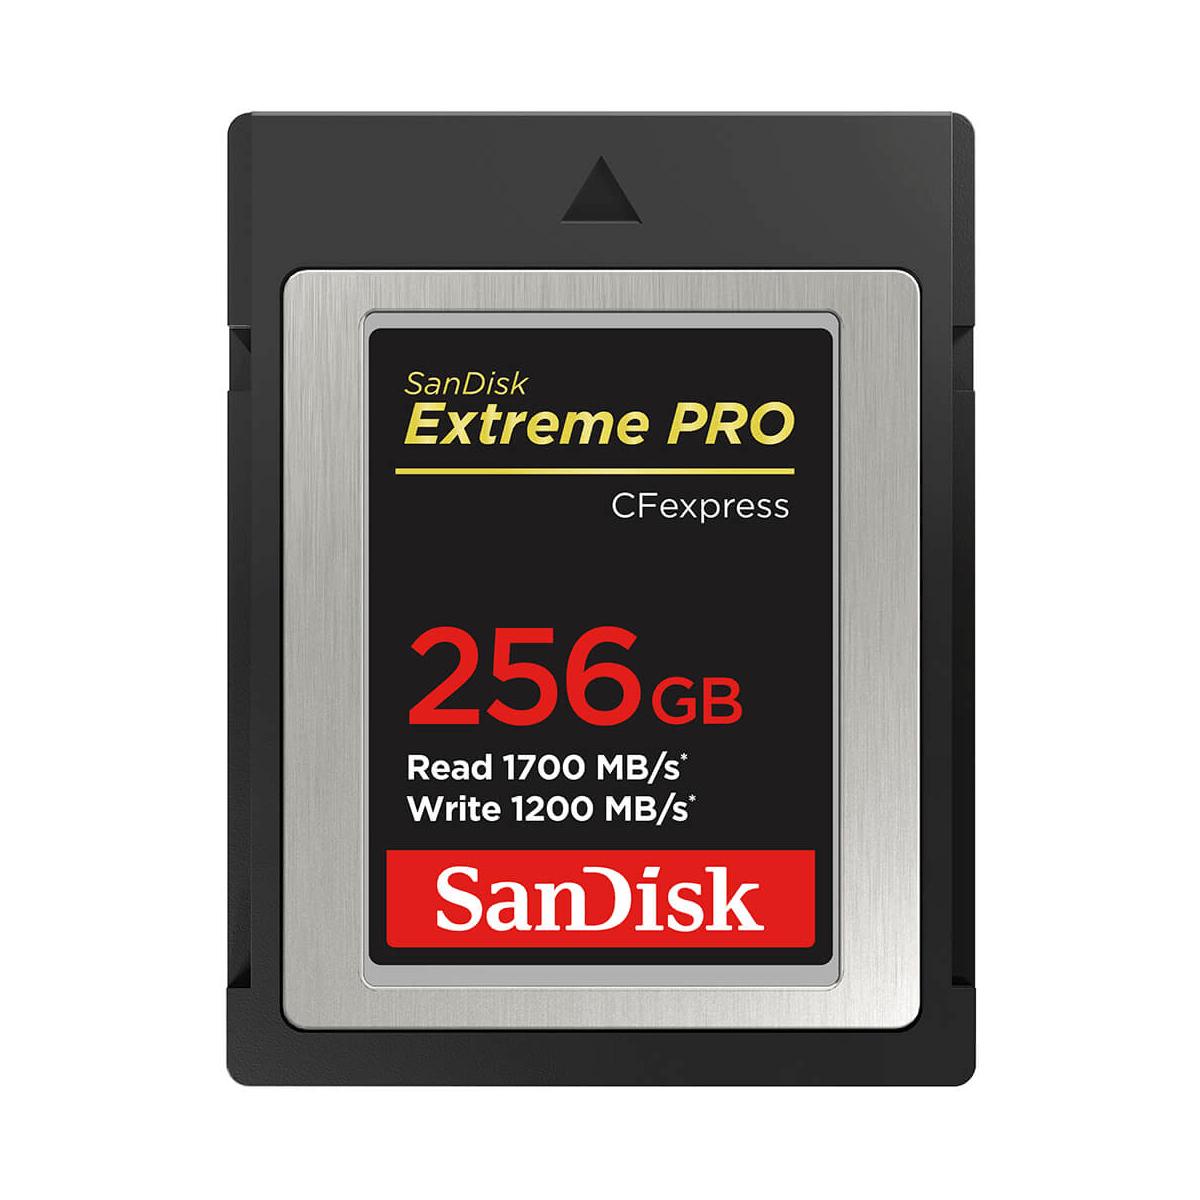 Sandisk Extreme Pro Type B CFexpress 256GB